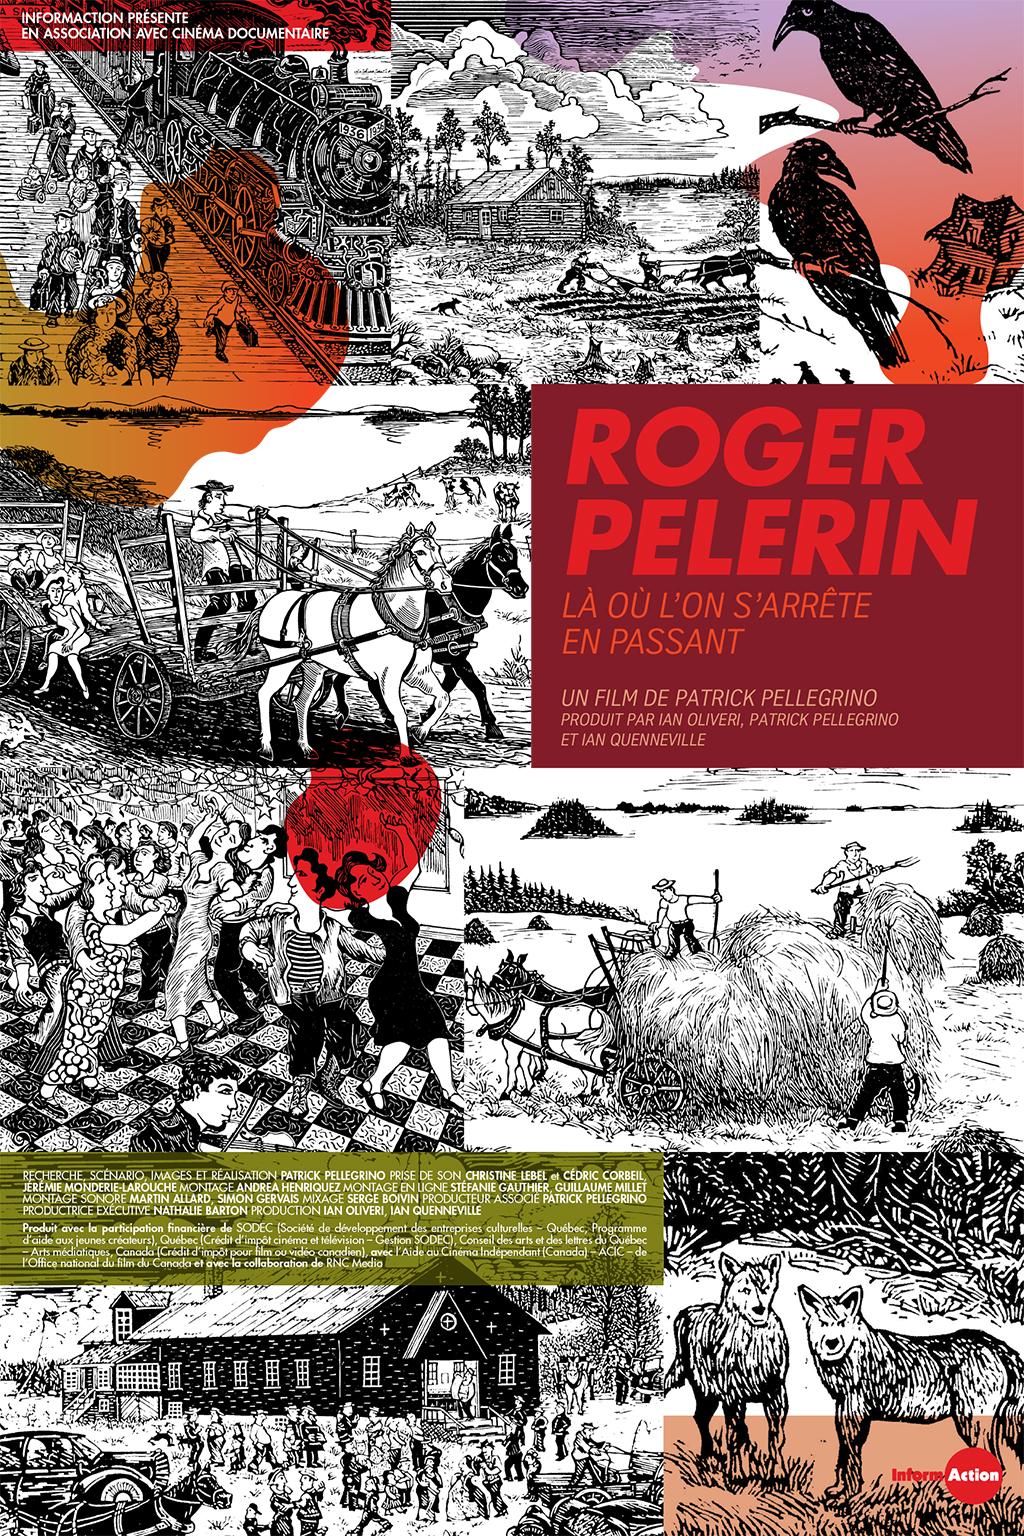 RogerPelerin_poster